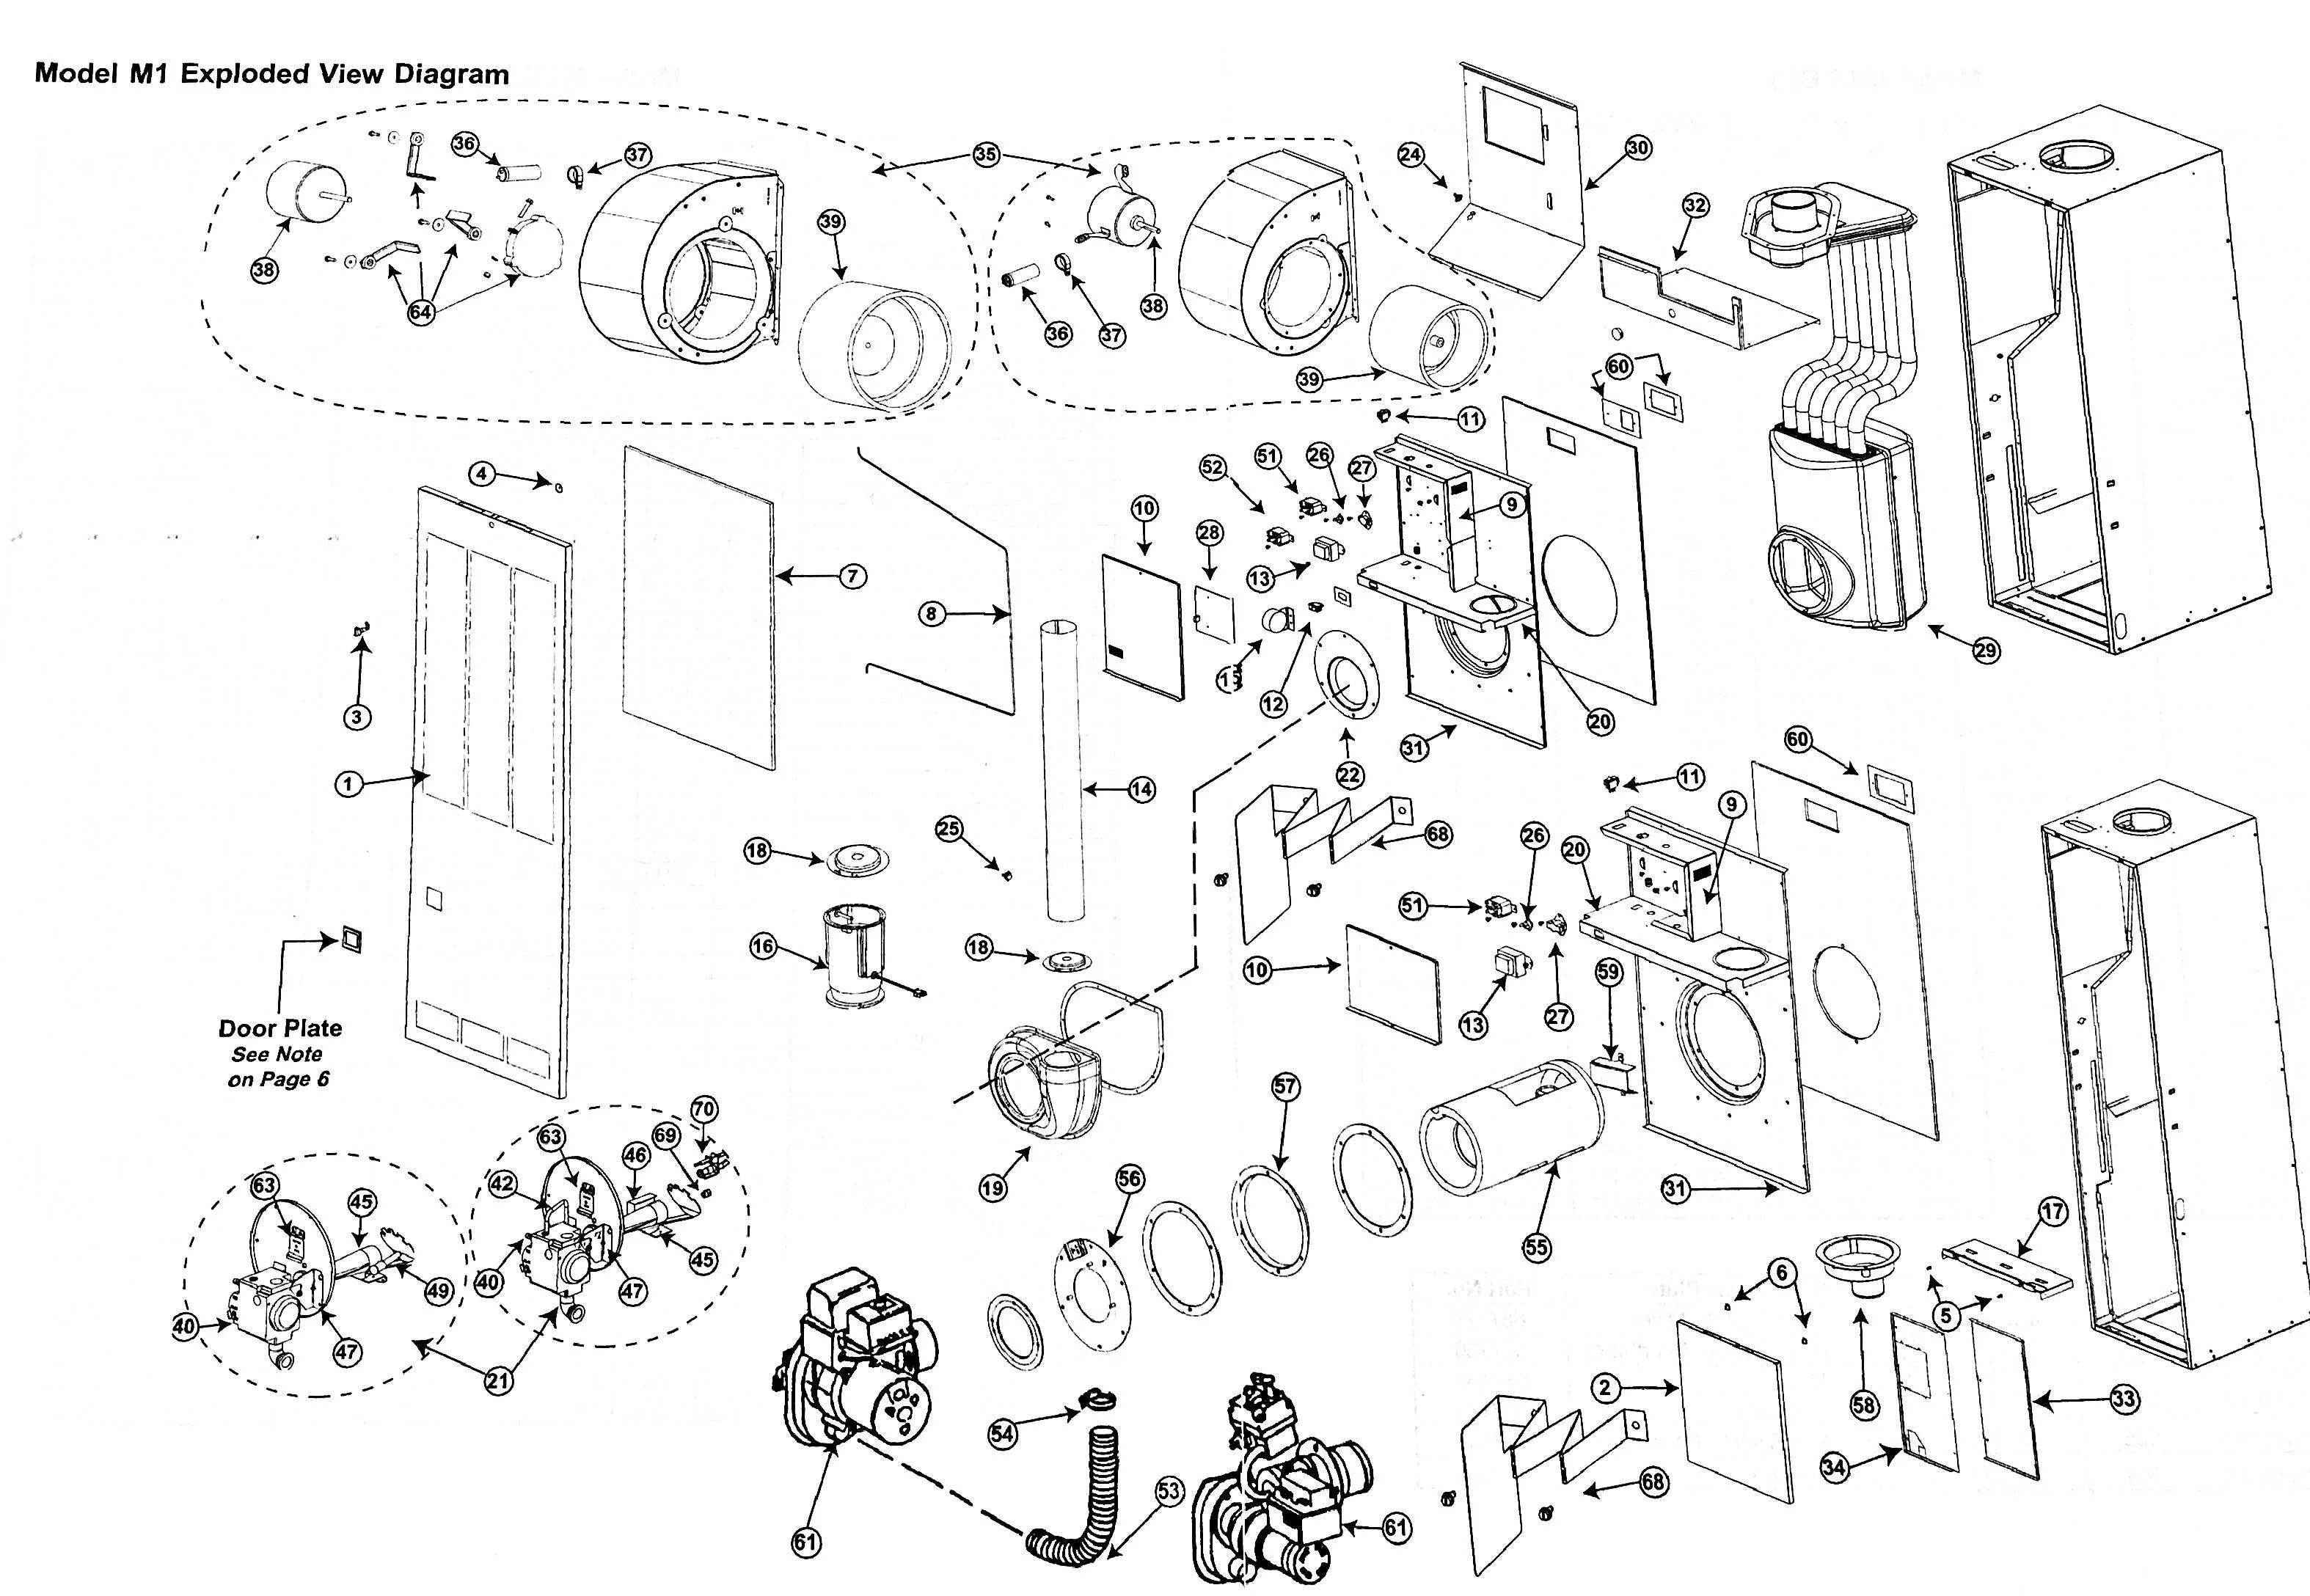 M1MB056 Nordyne Gas Furnace Parts – HVACpartstore